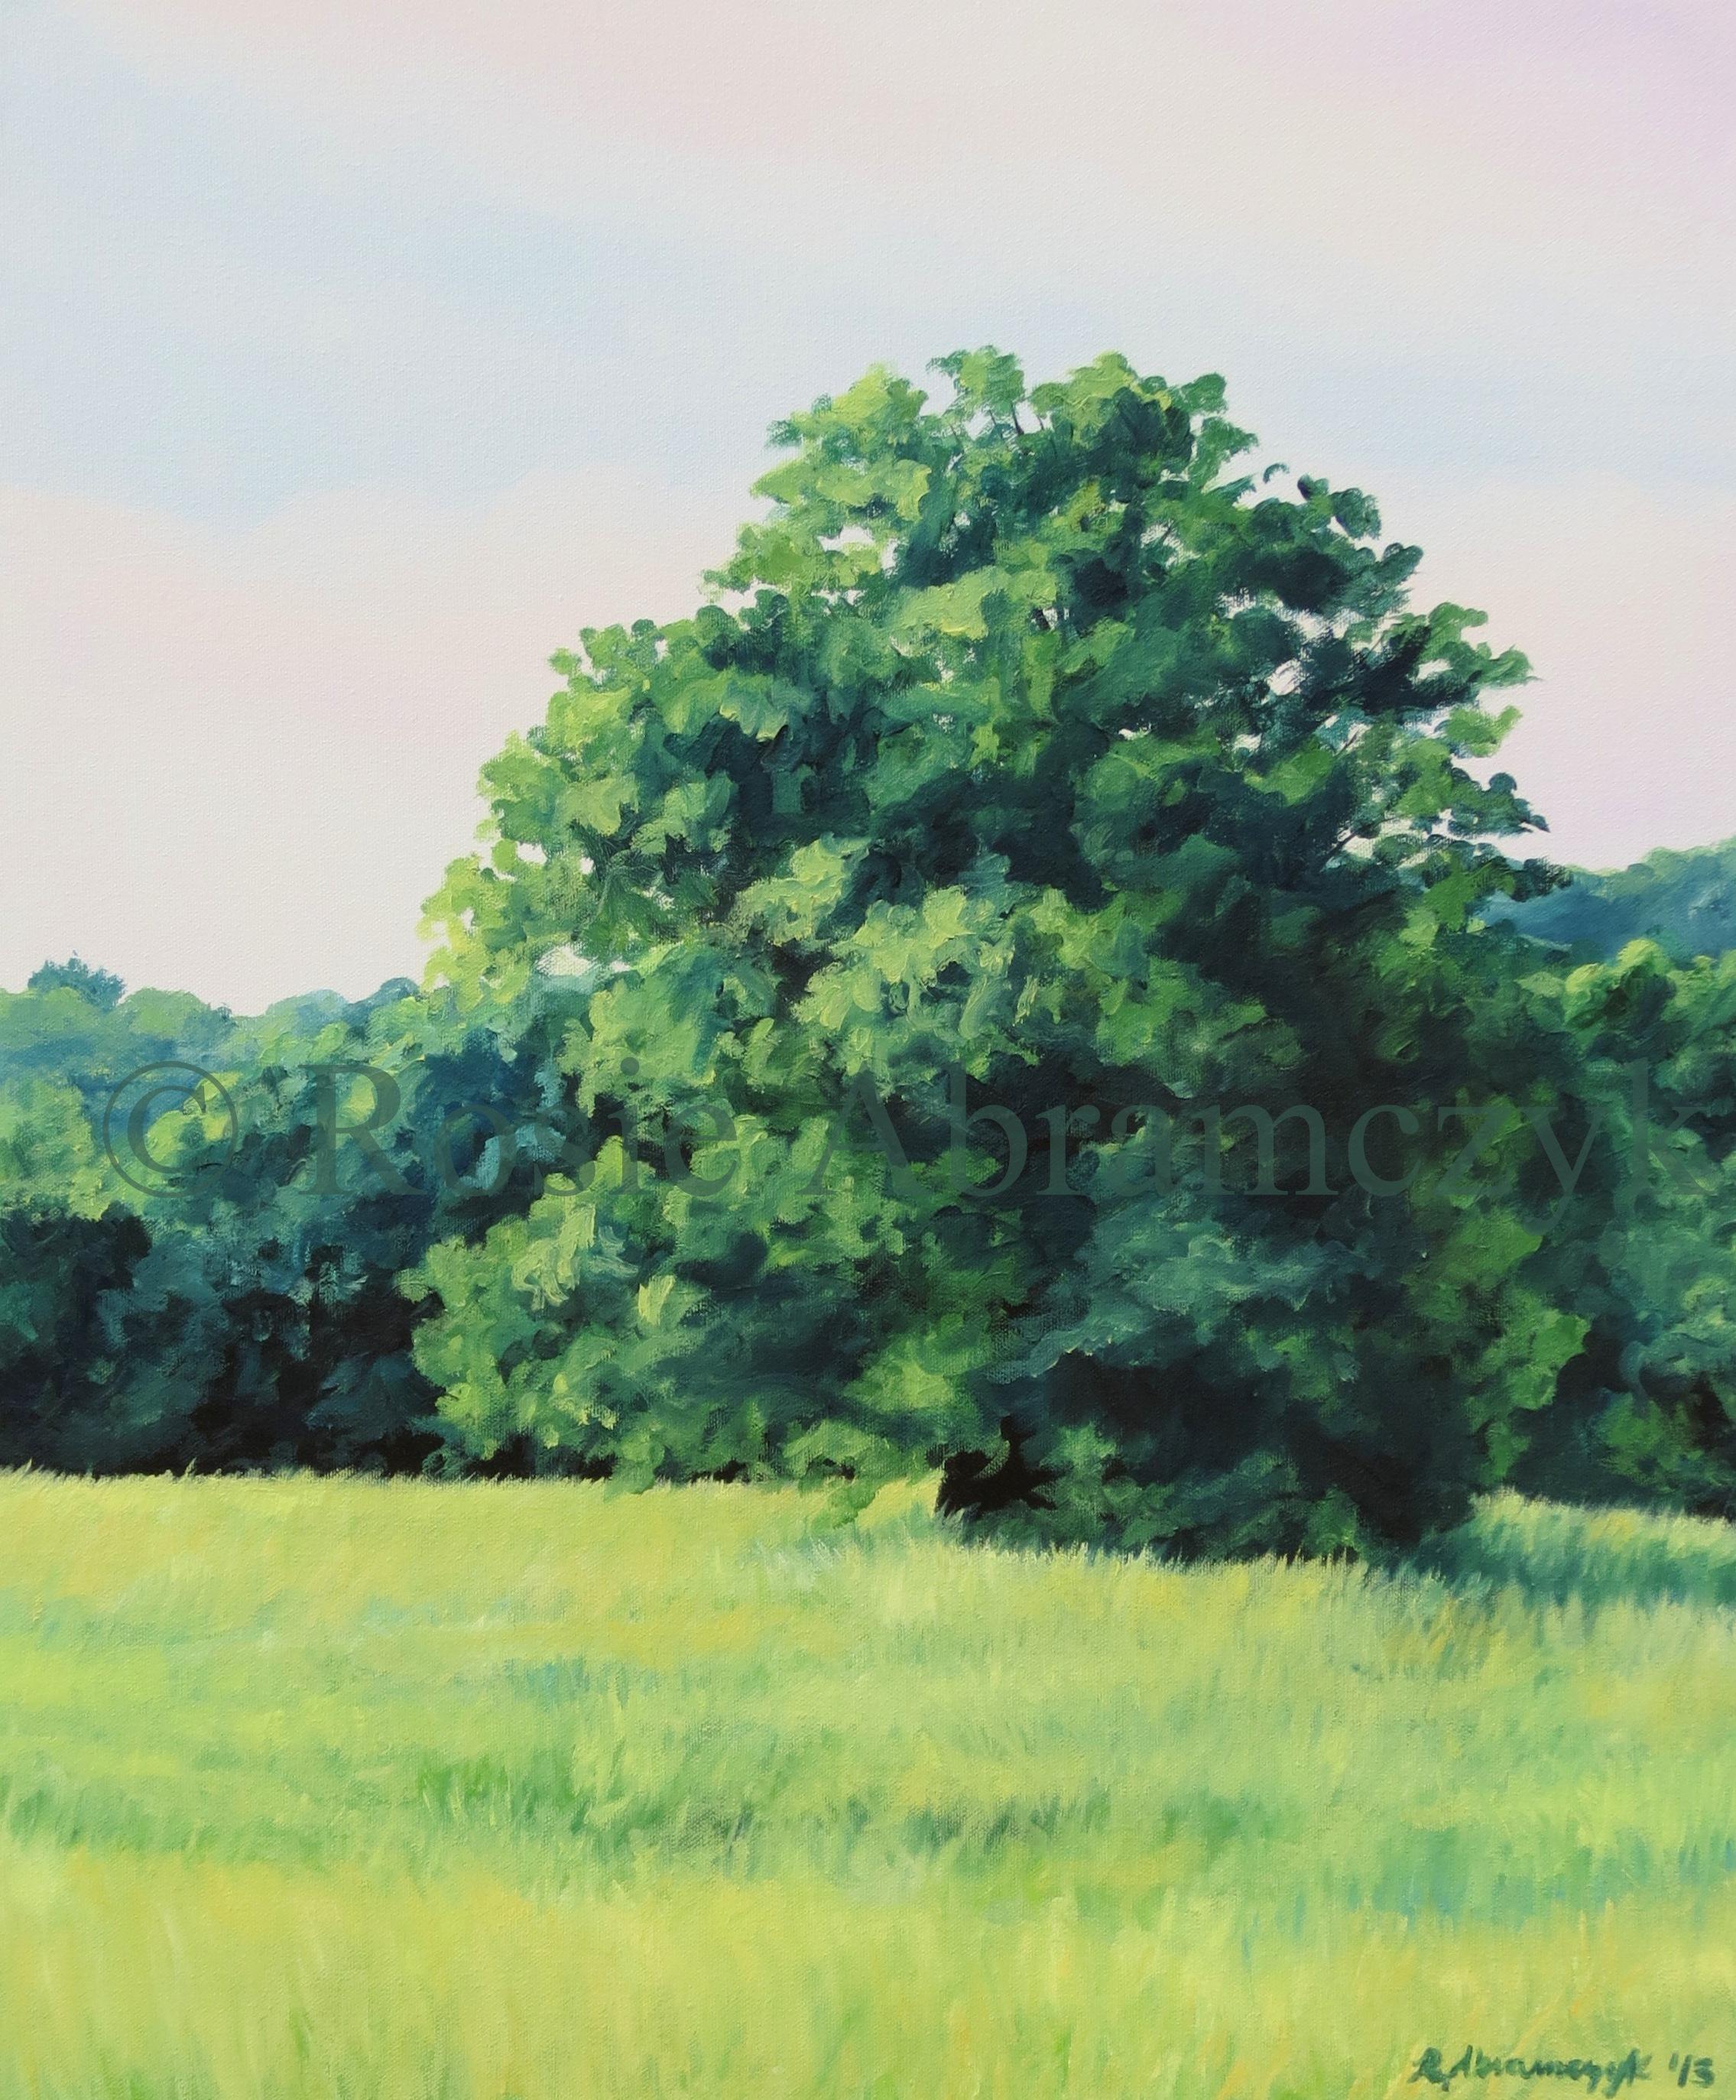 Spring Treeline in Lawson, MO, by Rosie Abramcyk, Oil Paint, 2013